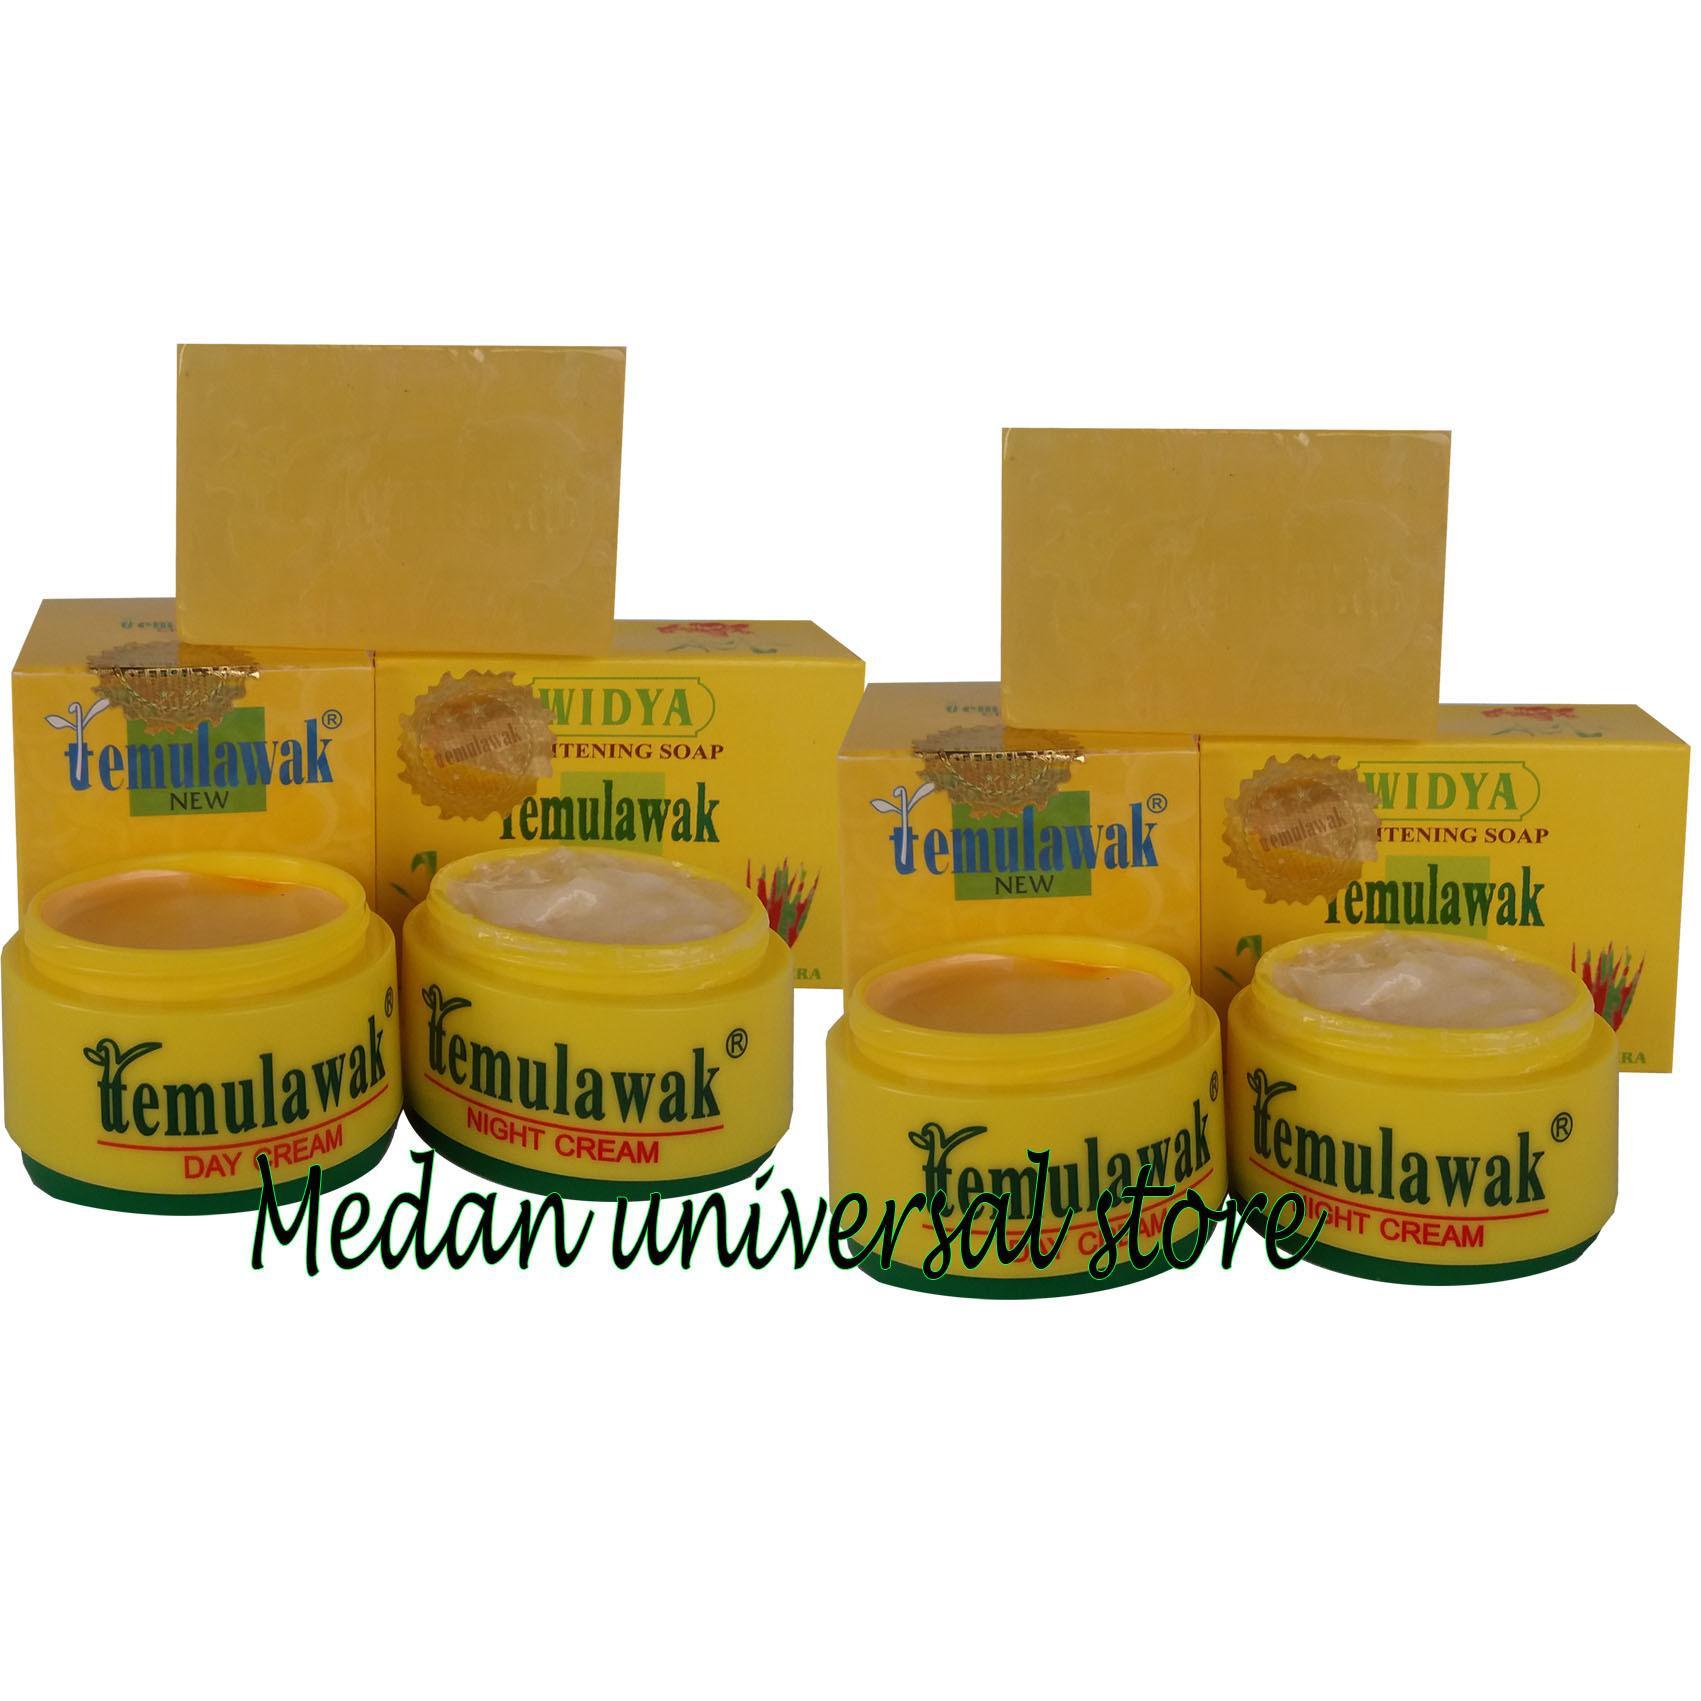 2 Paket Temulawak Cream Day & Night + Sabun Widya Aloe Vera Holo Besar